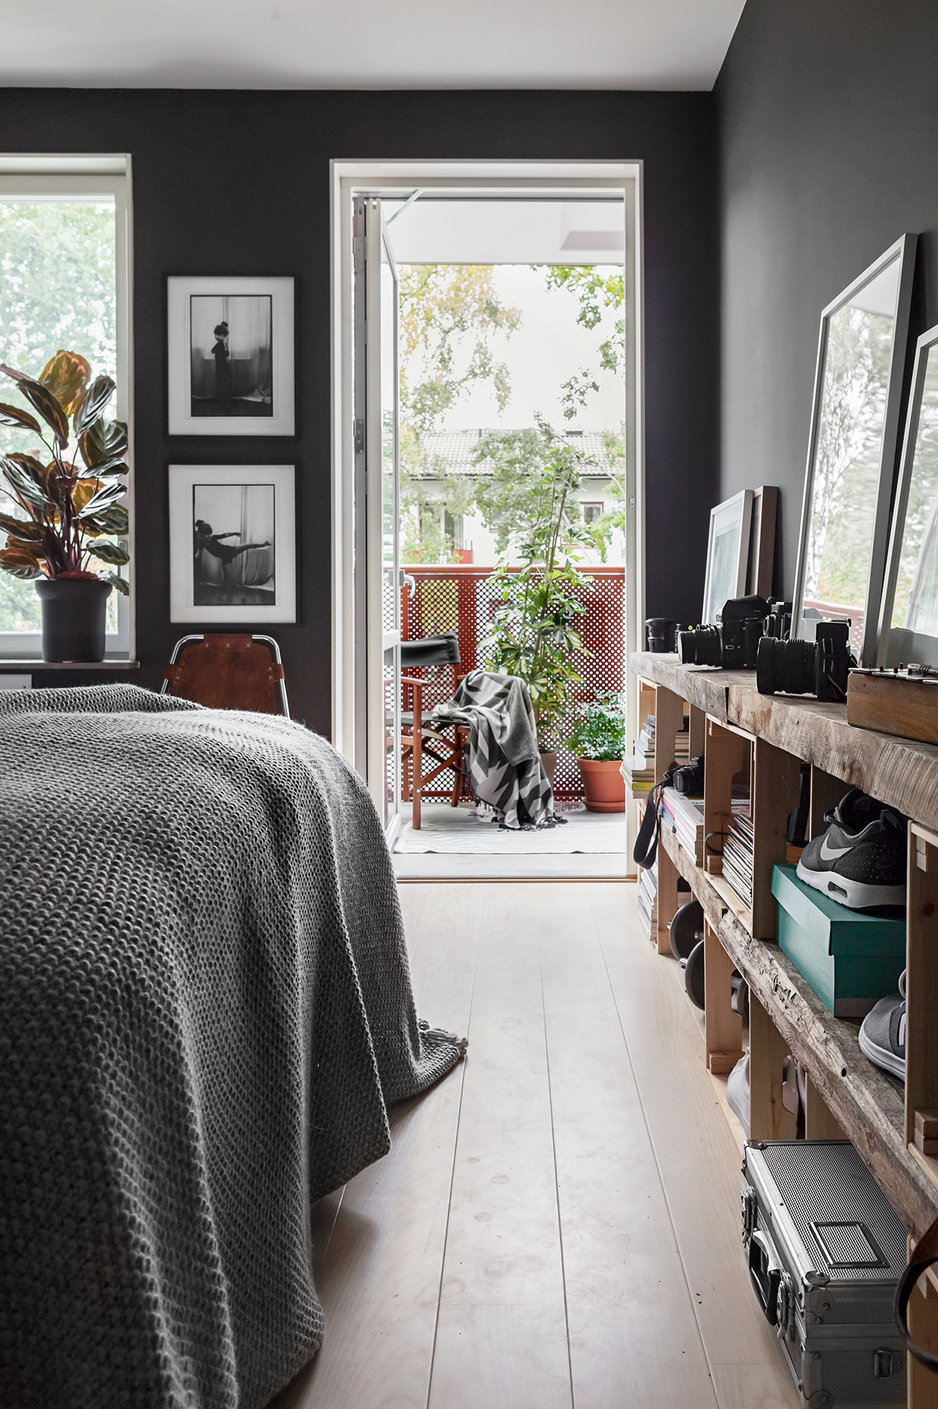 Scandinavian gray bedroom interior - Fantastic Frank via Design Studio 210